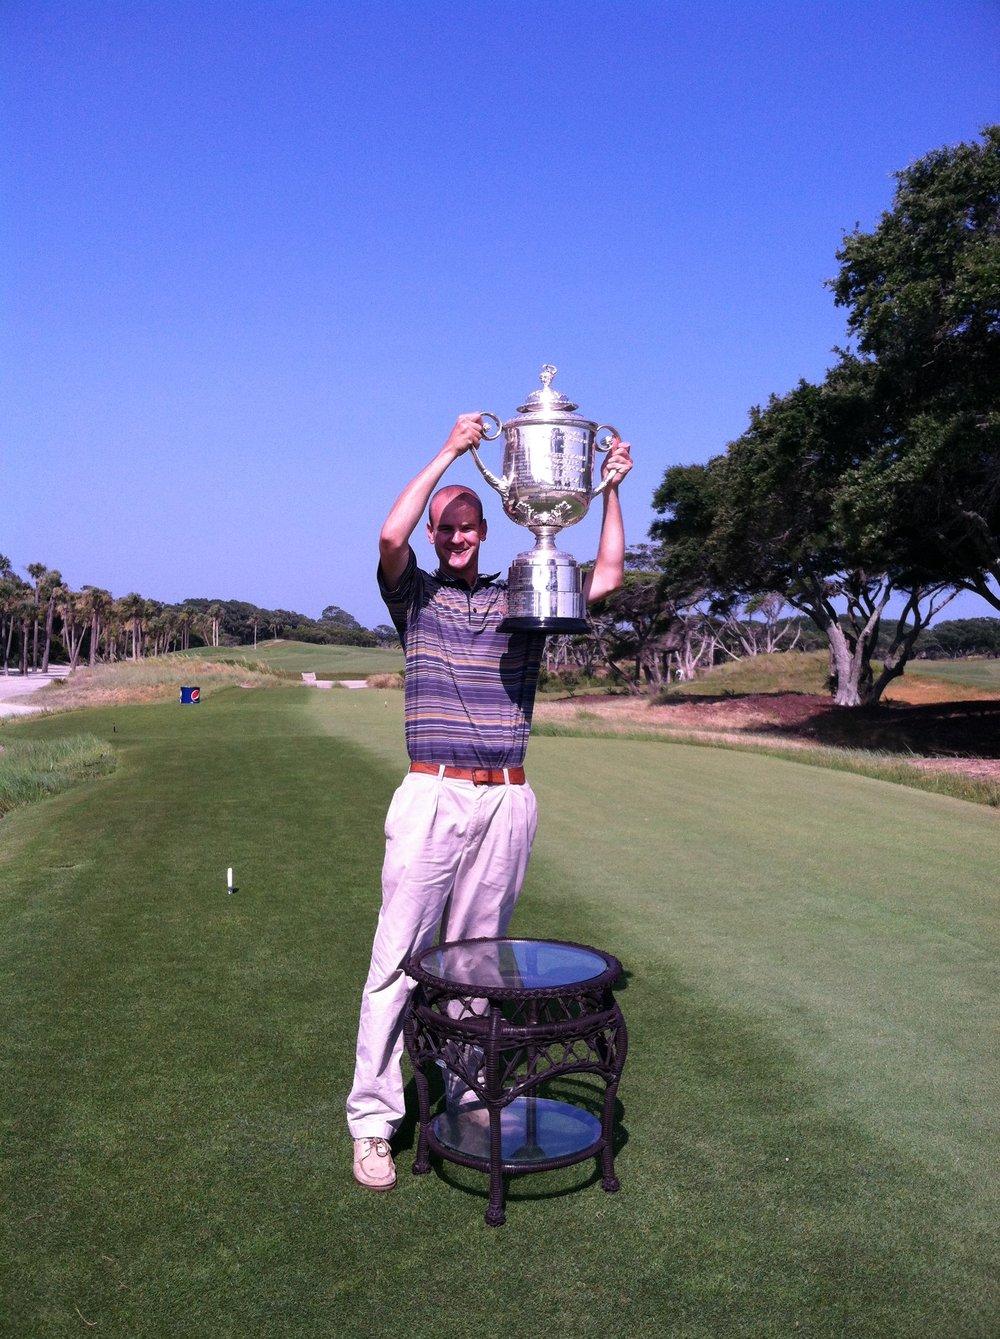 Hoisting the Wanamaker Trophy